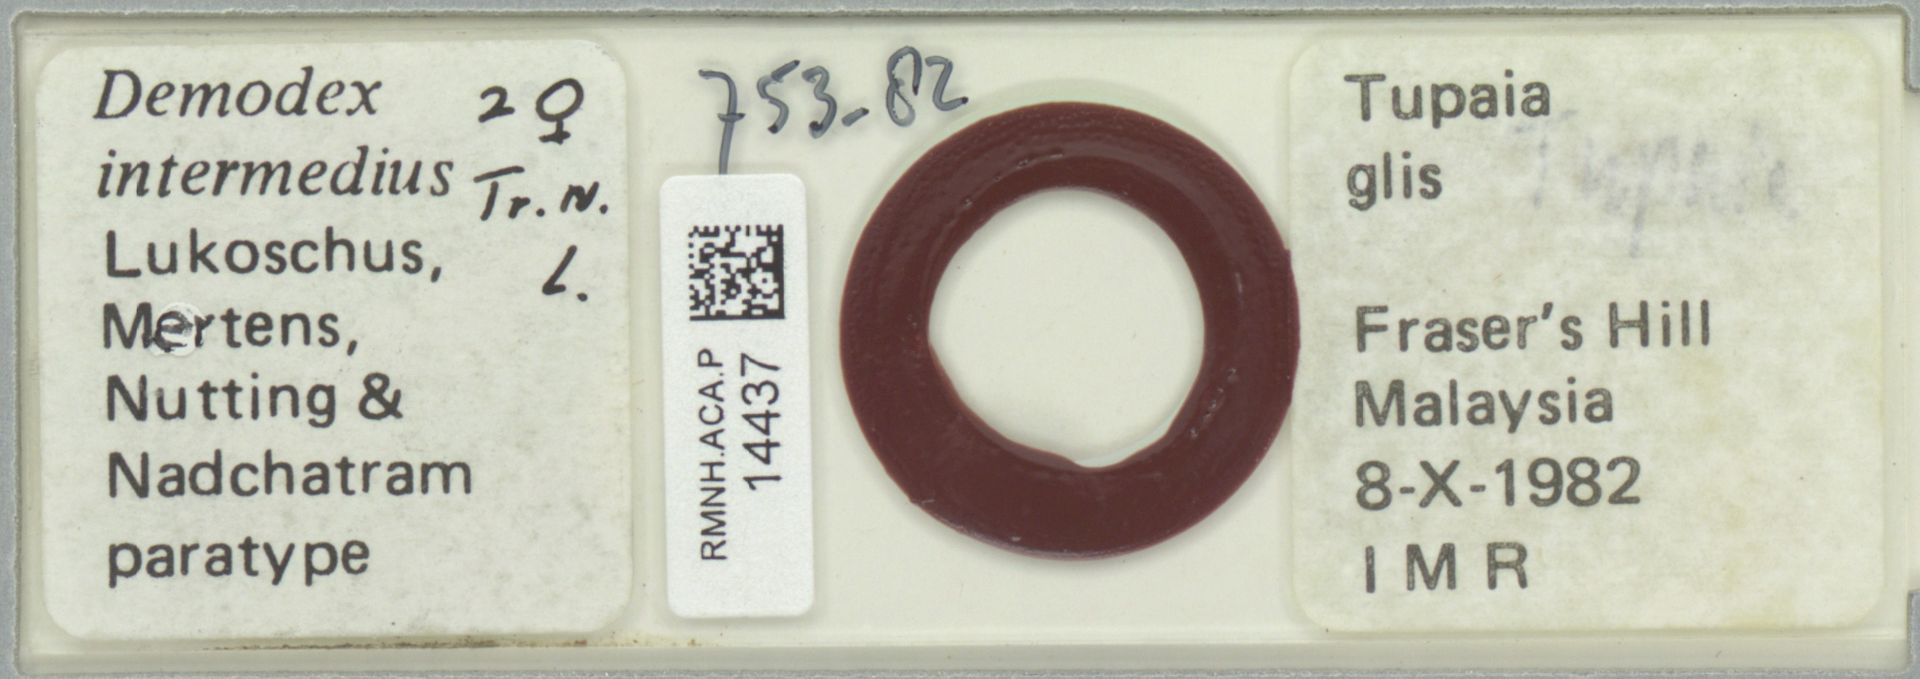 RMNH.ACA.P.14437 | Demodex intermedius Lukoschus, Mertens, Nutting & Nadchatram